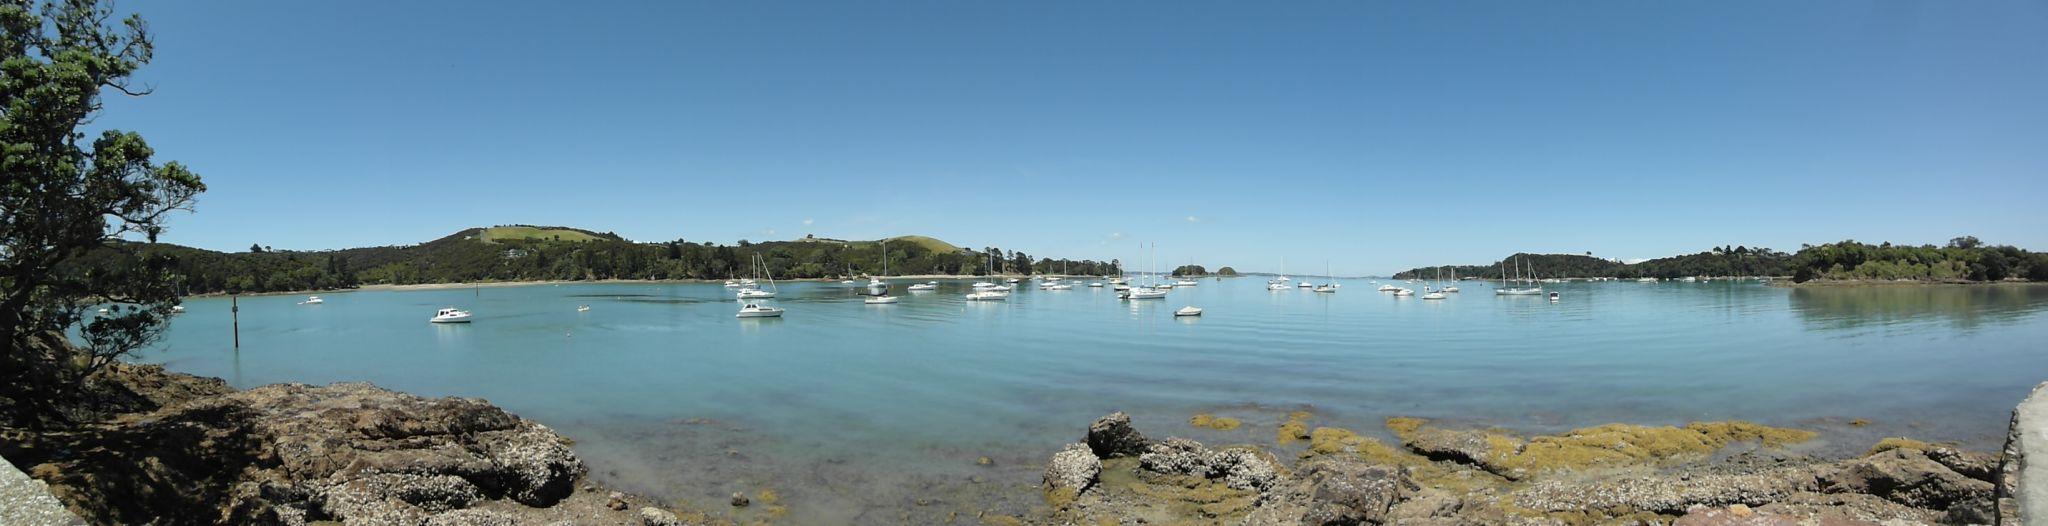 Waiheke Island Bike Tour, New Zealand